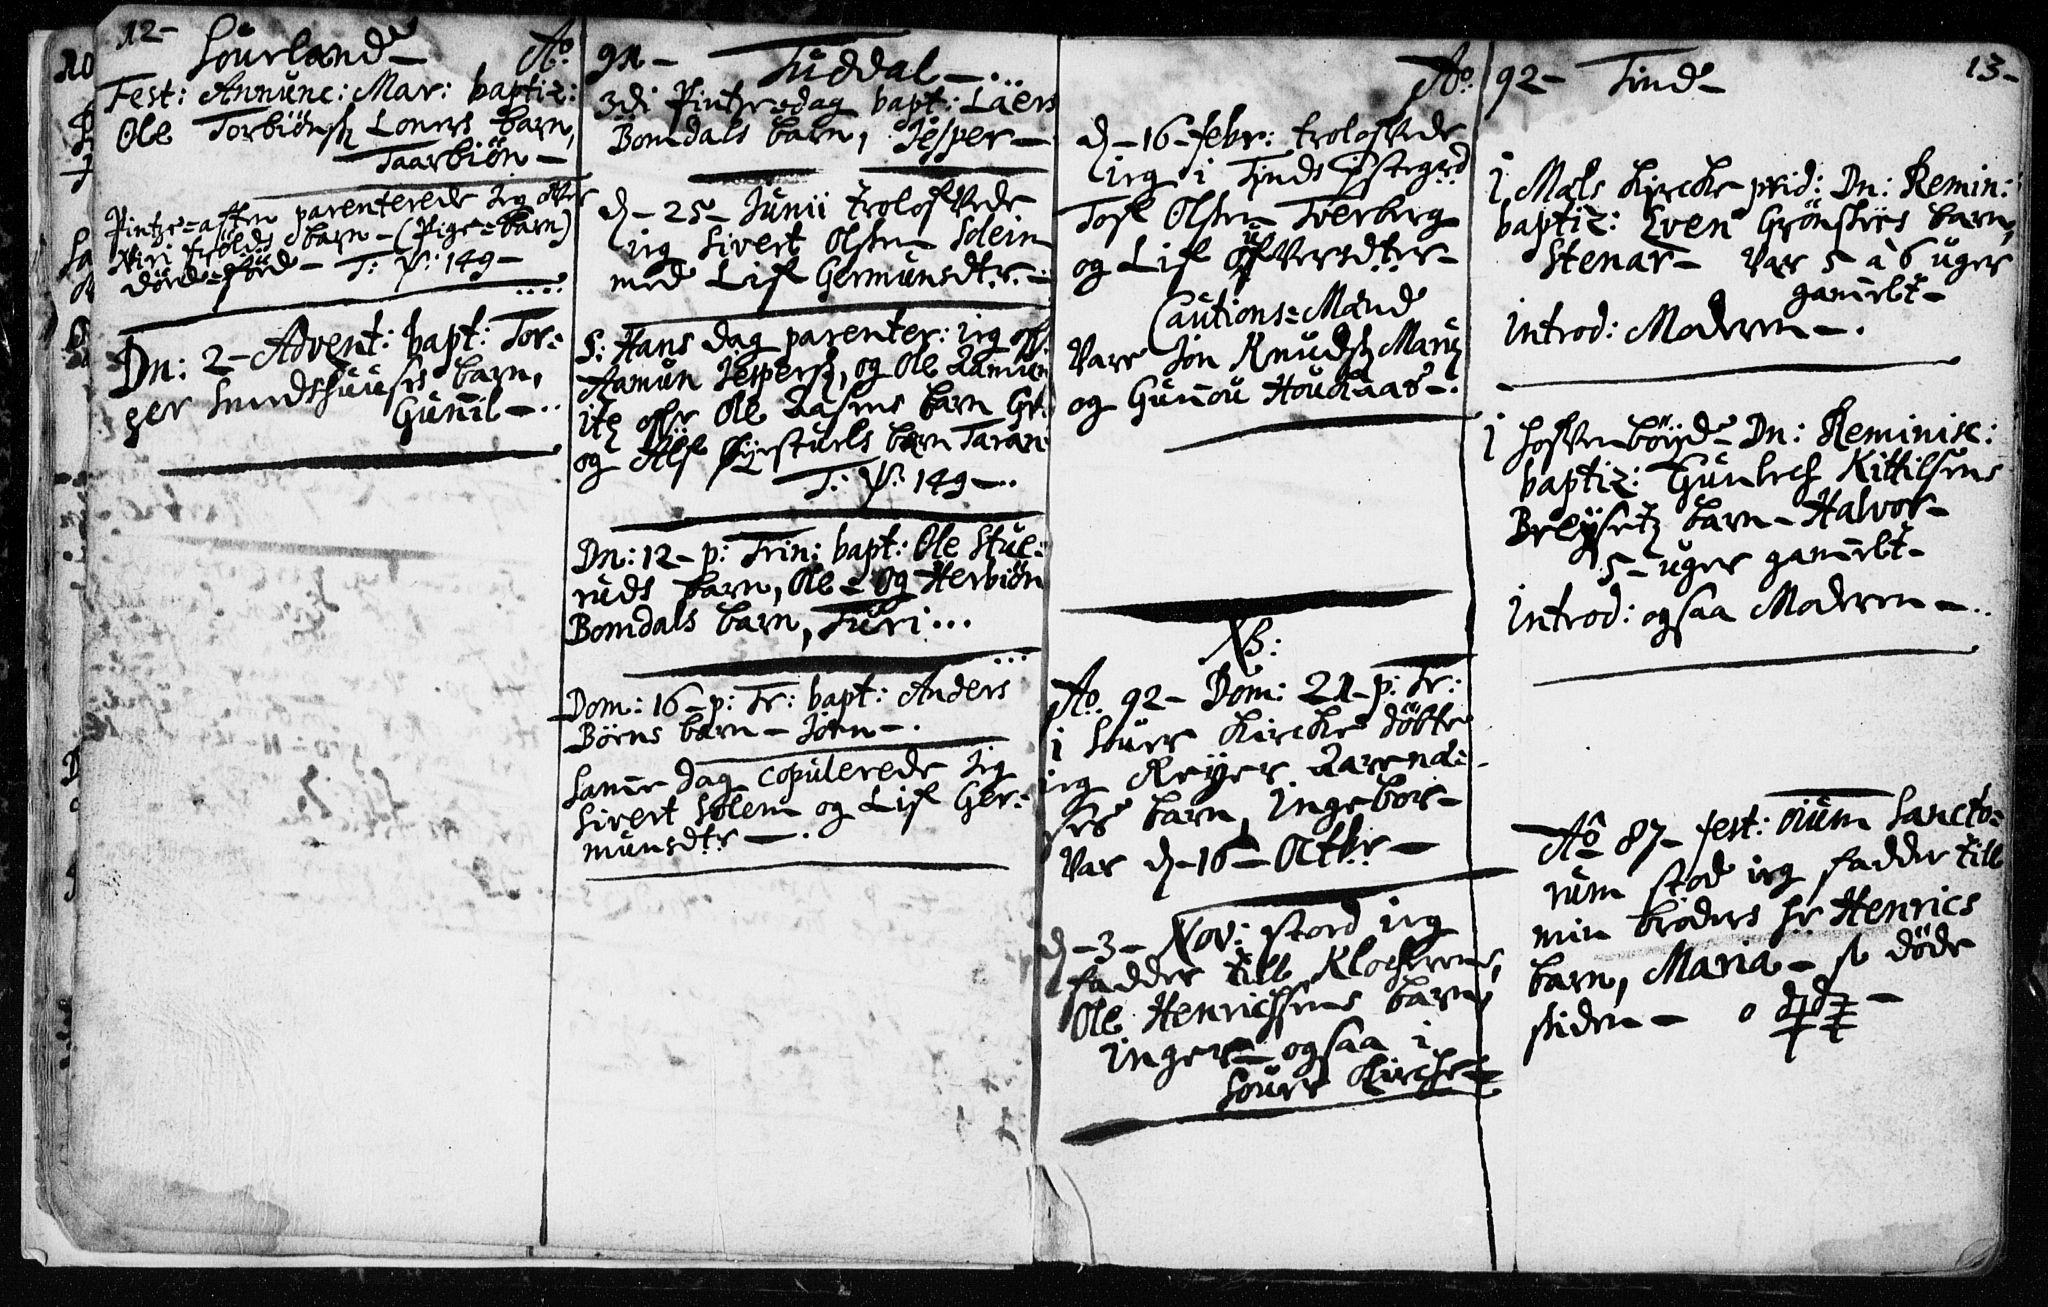 SAKO, Hjartdal kirkebøker, F/Fa/L0001: Ministerialbok nr. I 1, 1685-1714, s. 12-13